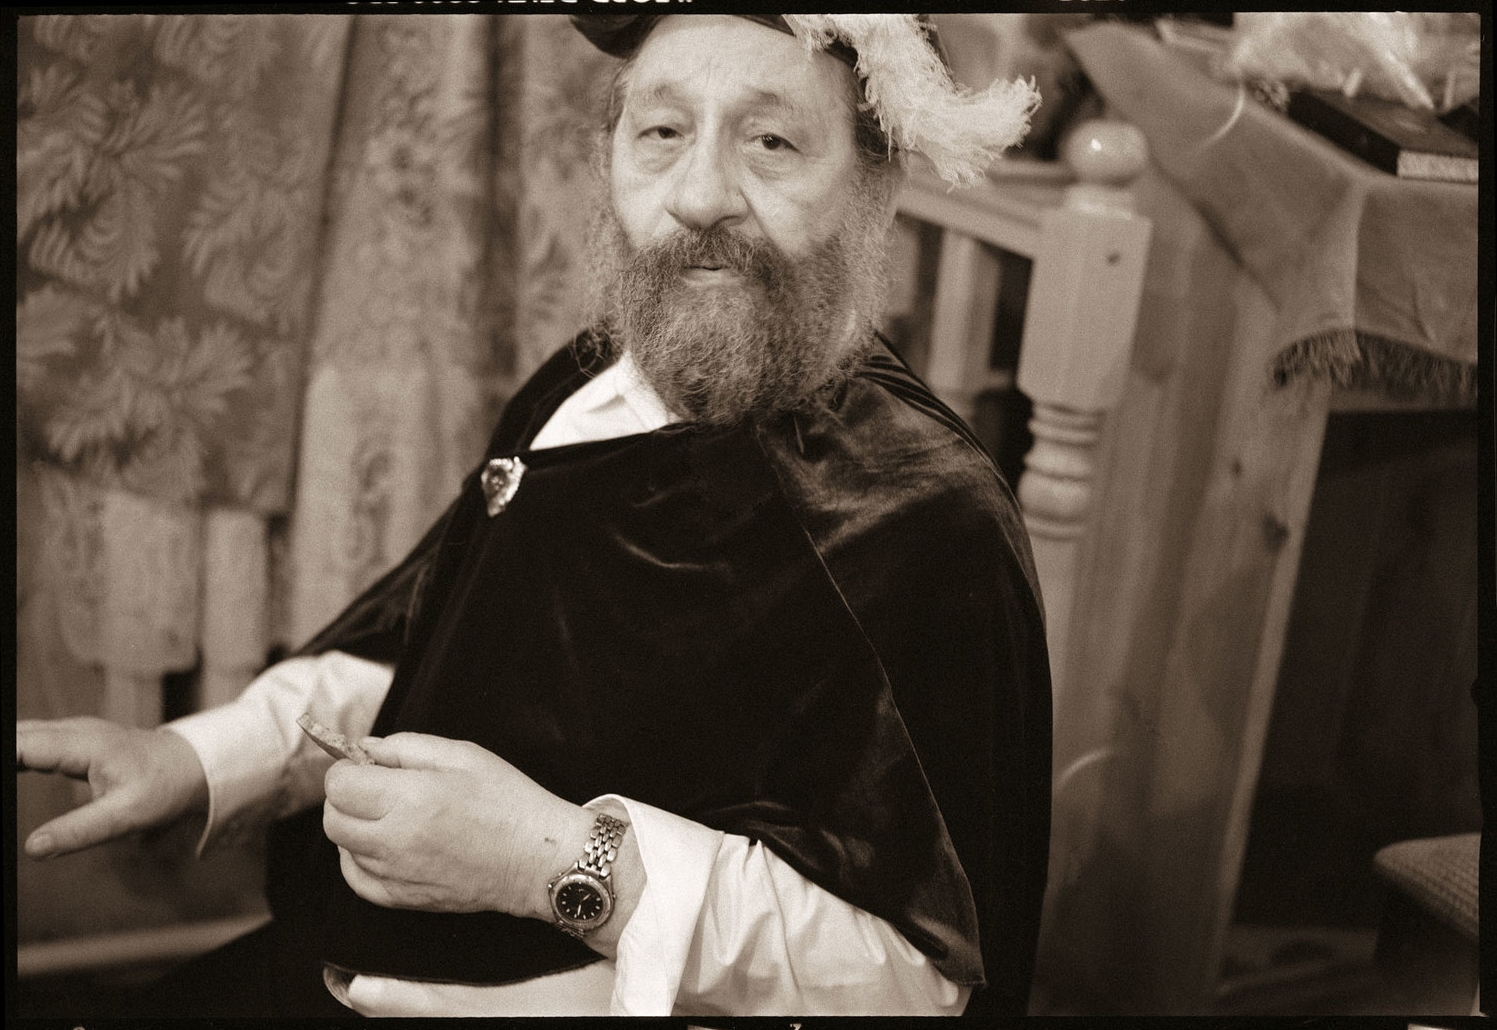 Rebbe Hoffman in Costume